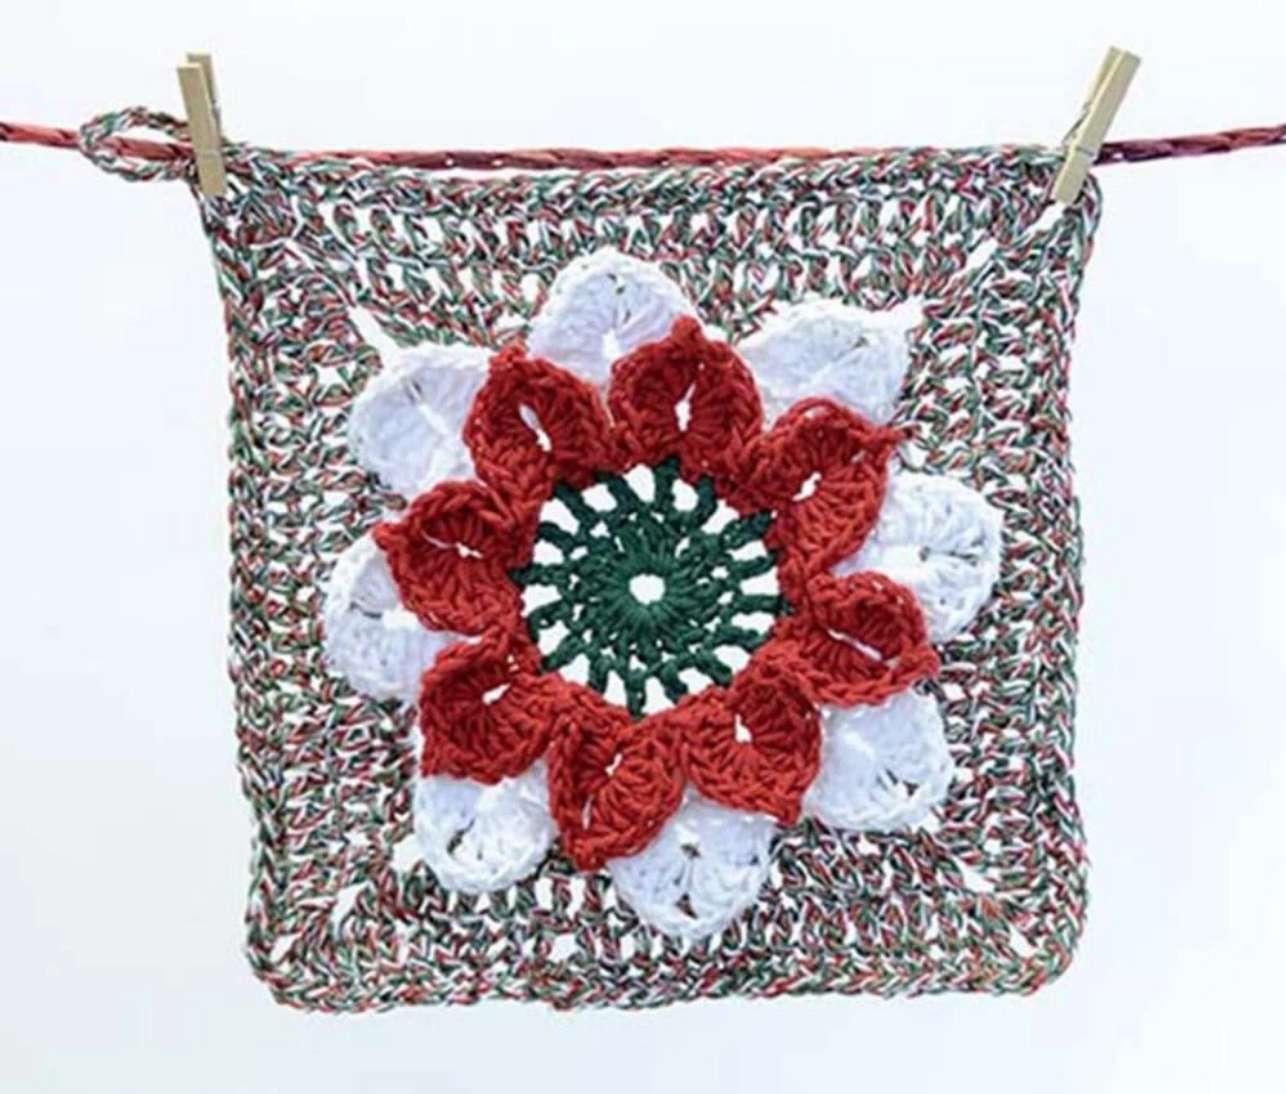 Dimensional Poinsettia Washcloth Pattern